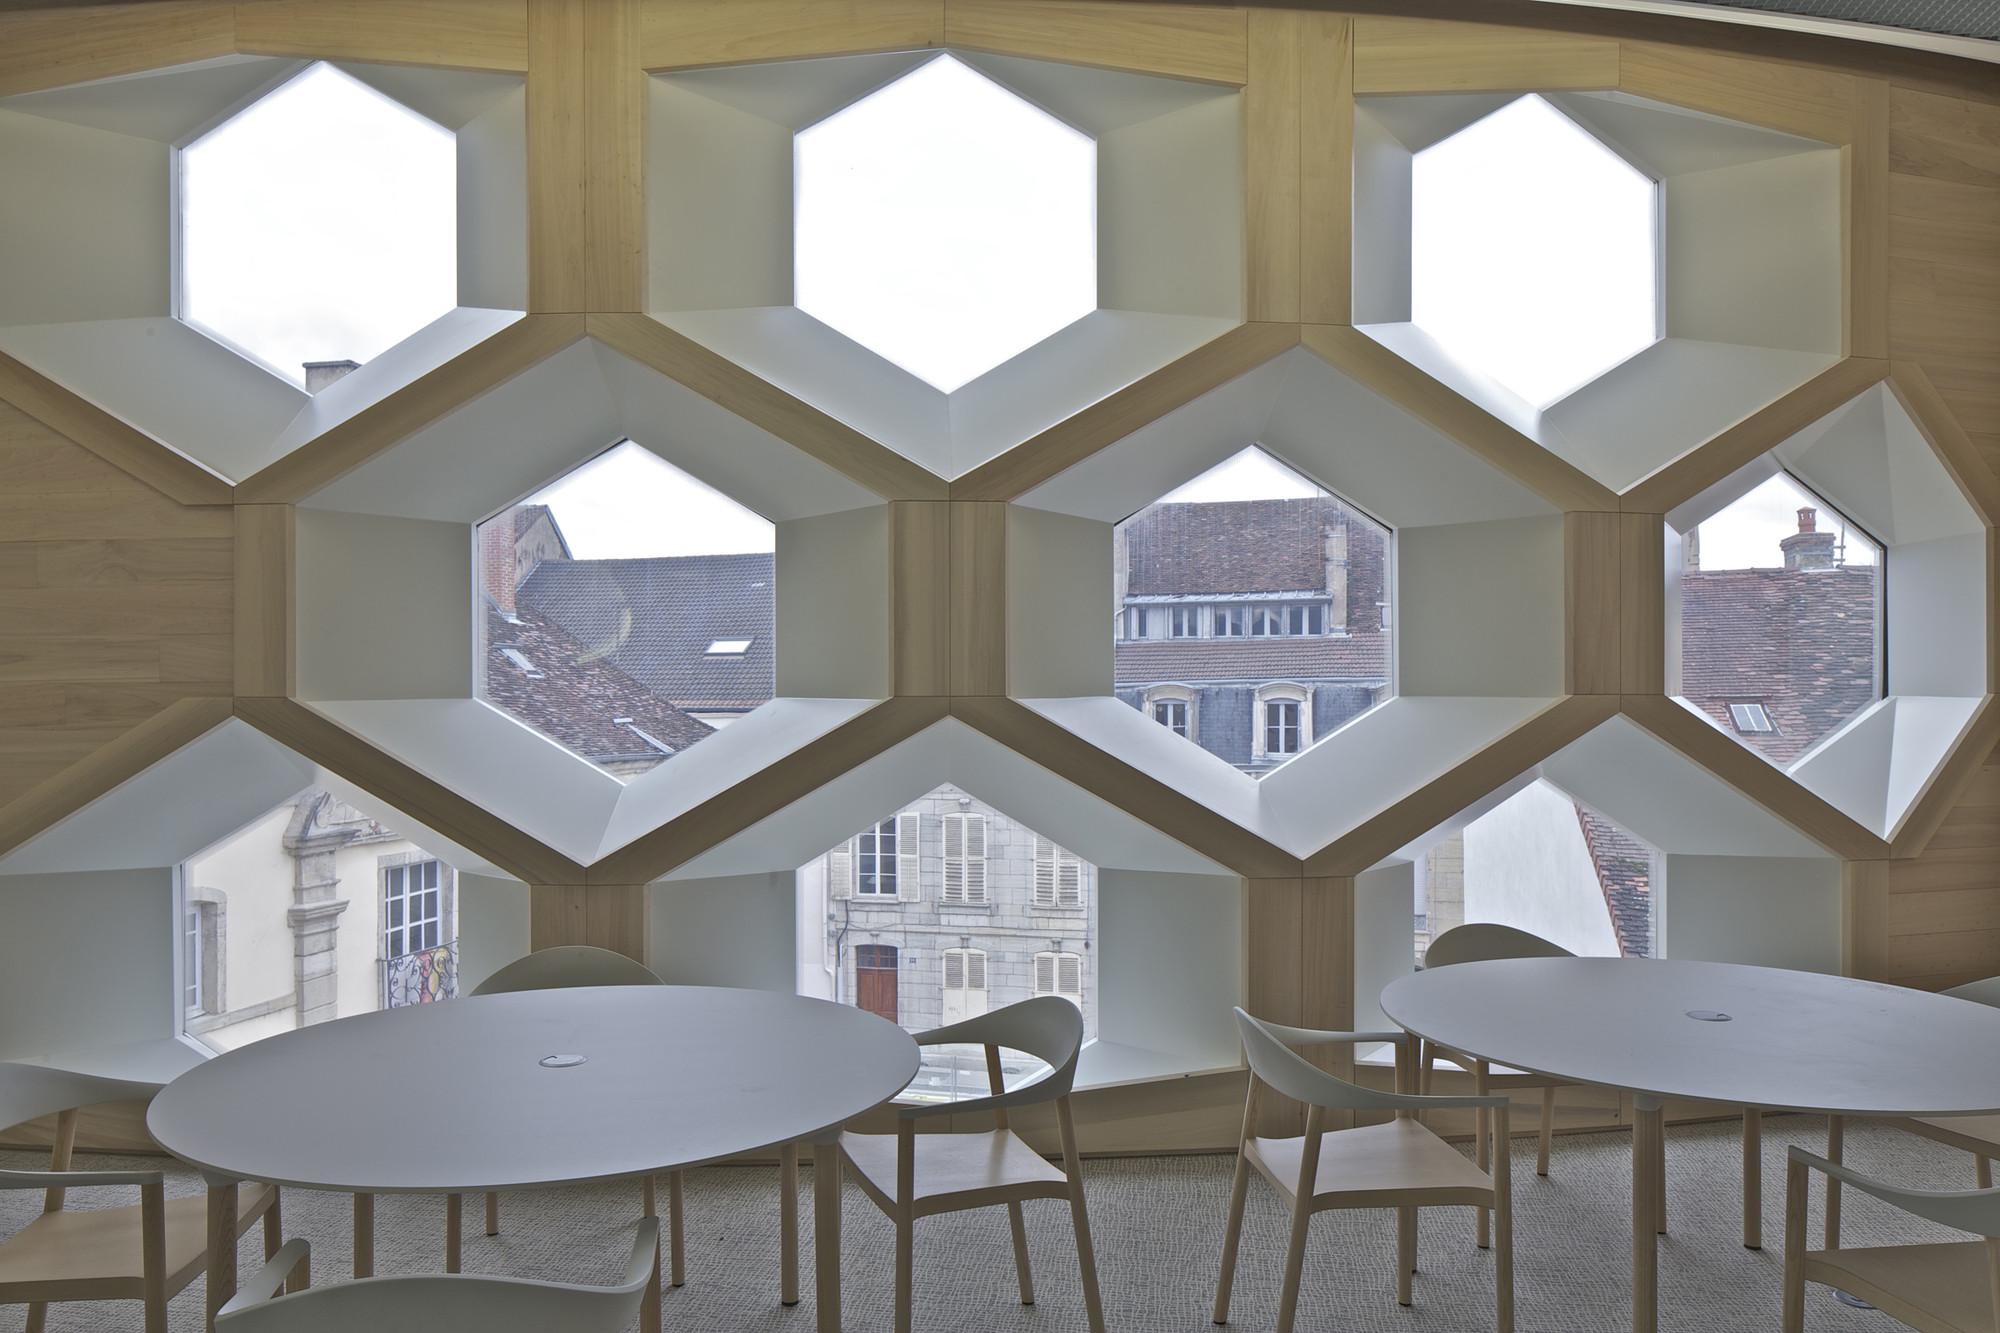 gallery of lons le saunier mediatheque du besset lyon architectes 14. Black Bedroom Furniture Sets. Home Design Ideas